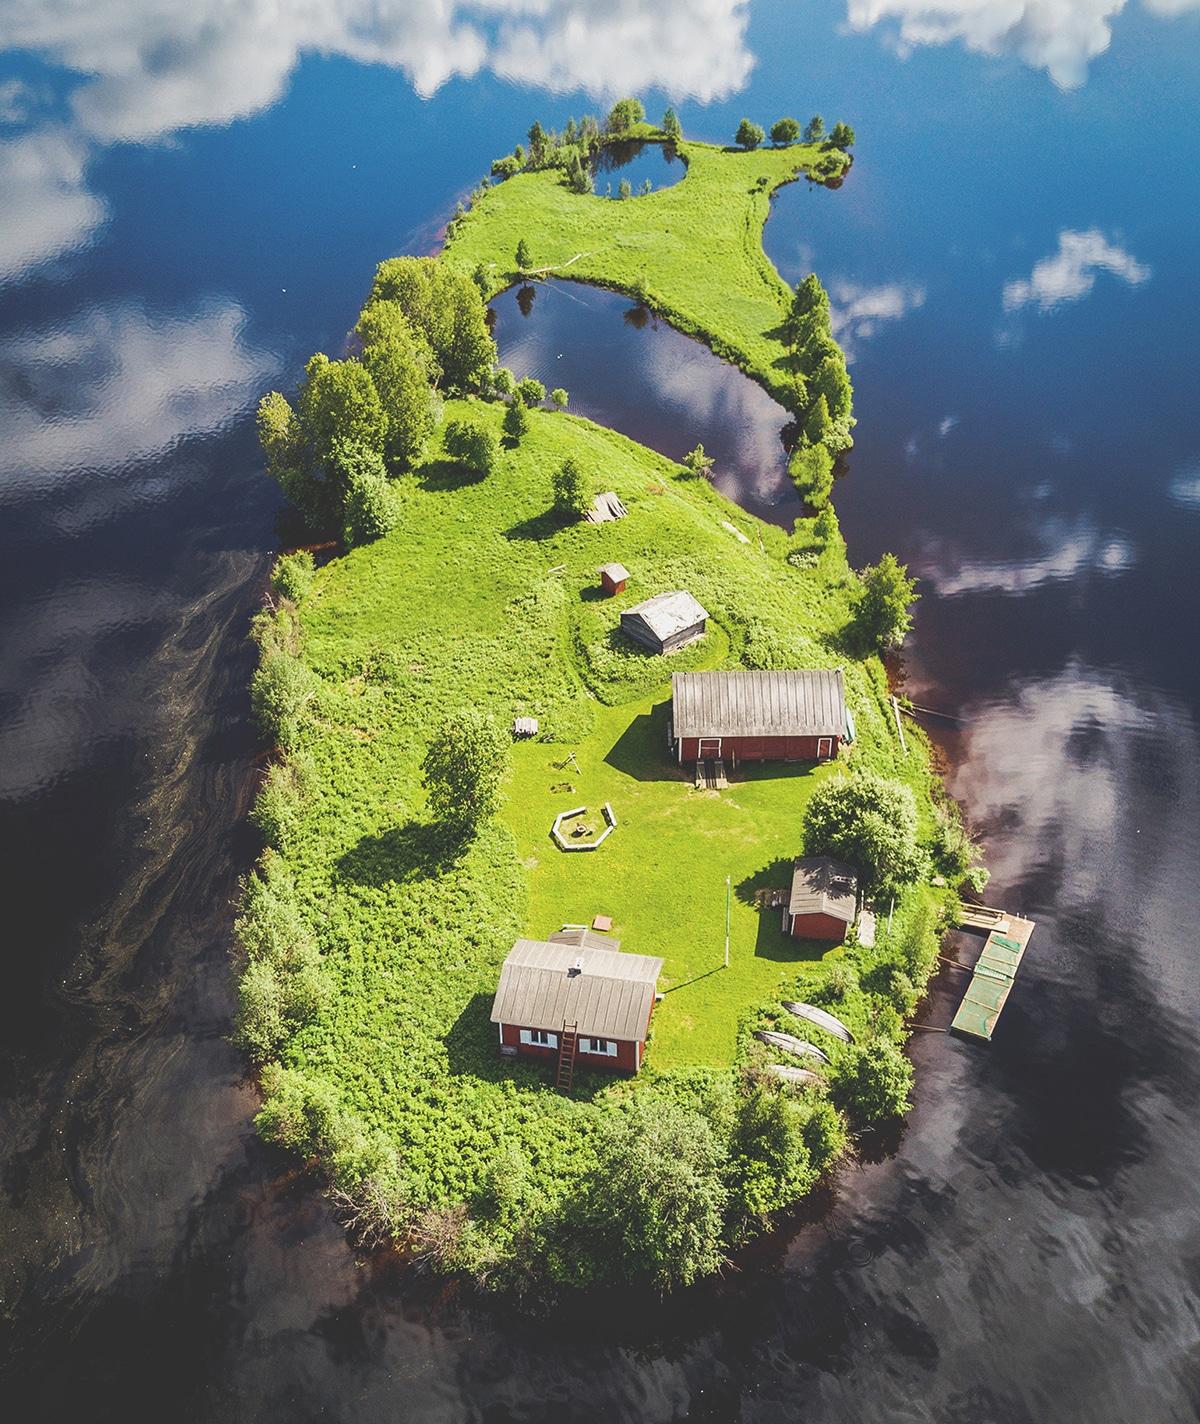 Jani Ylinampa Isla Kotisaari en Finlandia Laponia Finlandesa